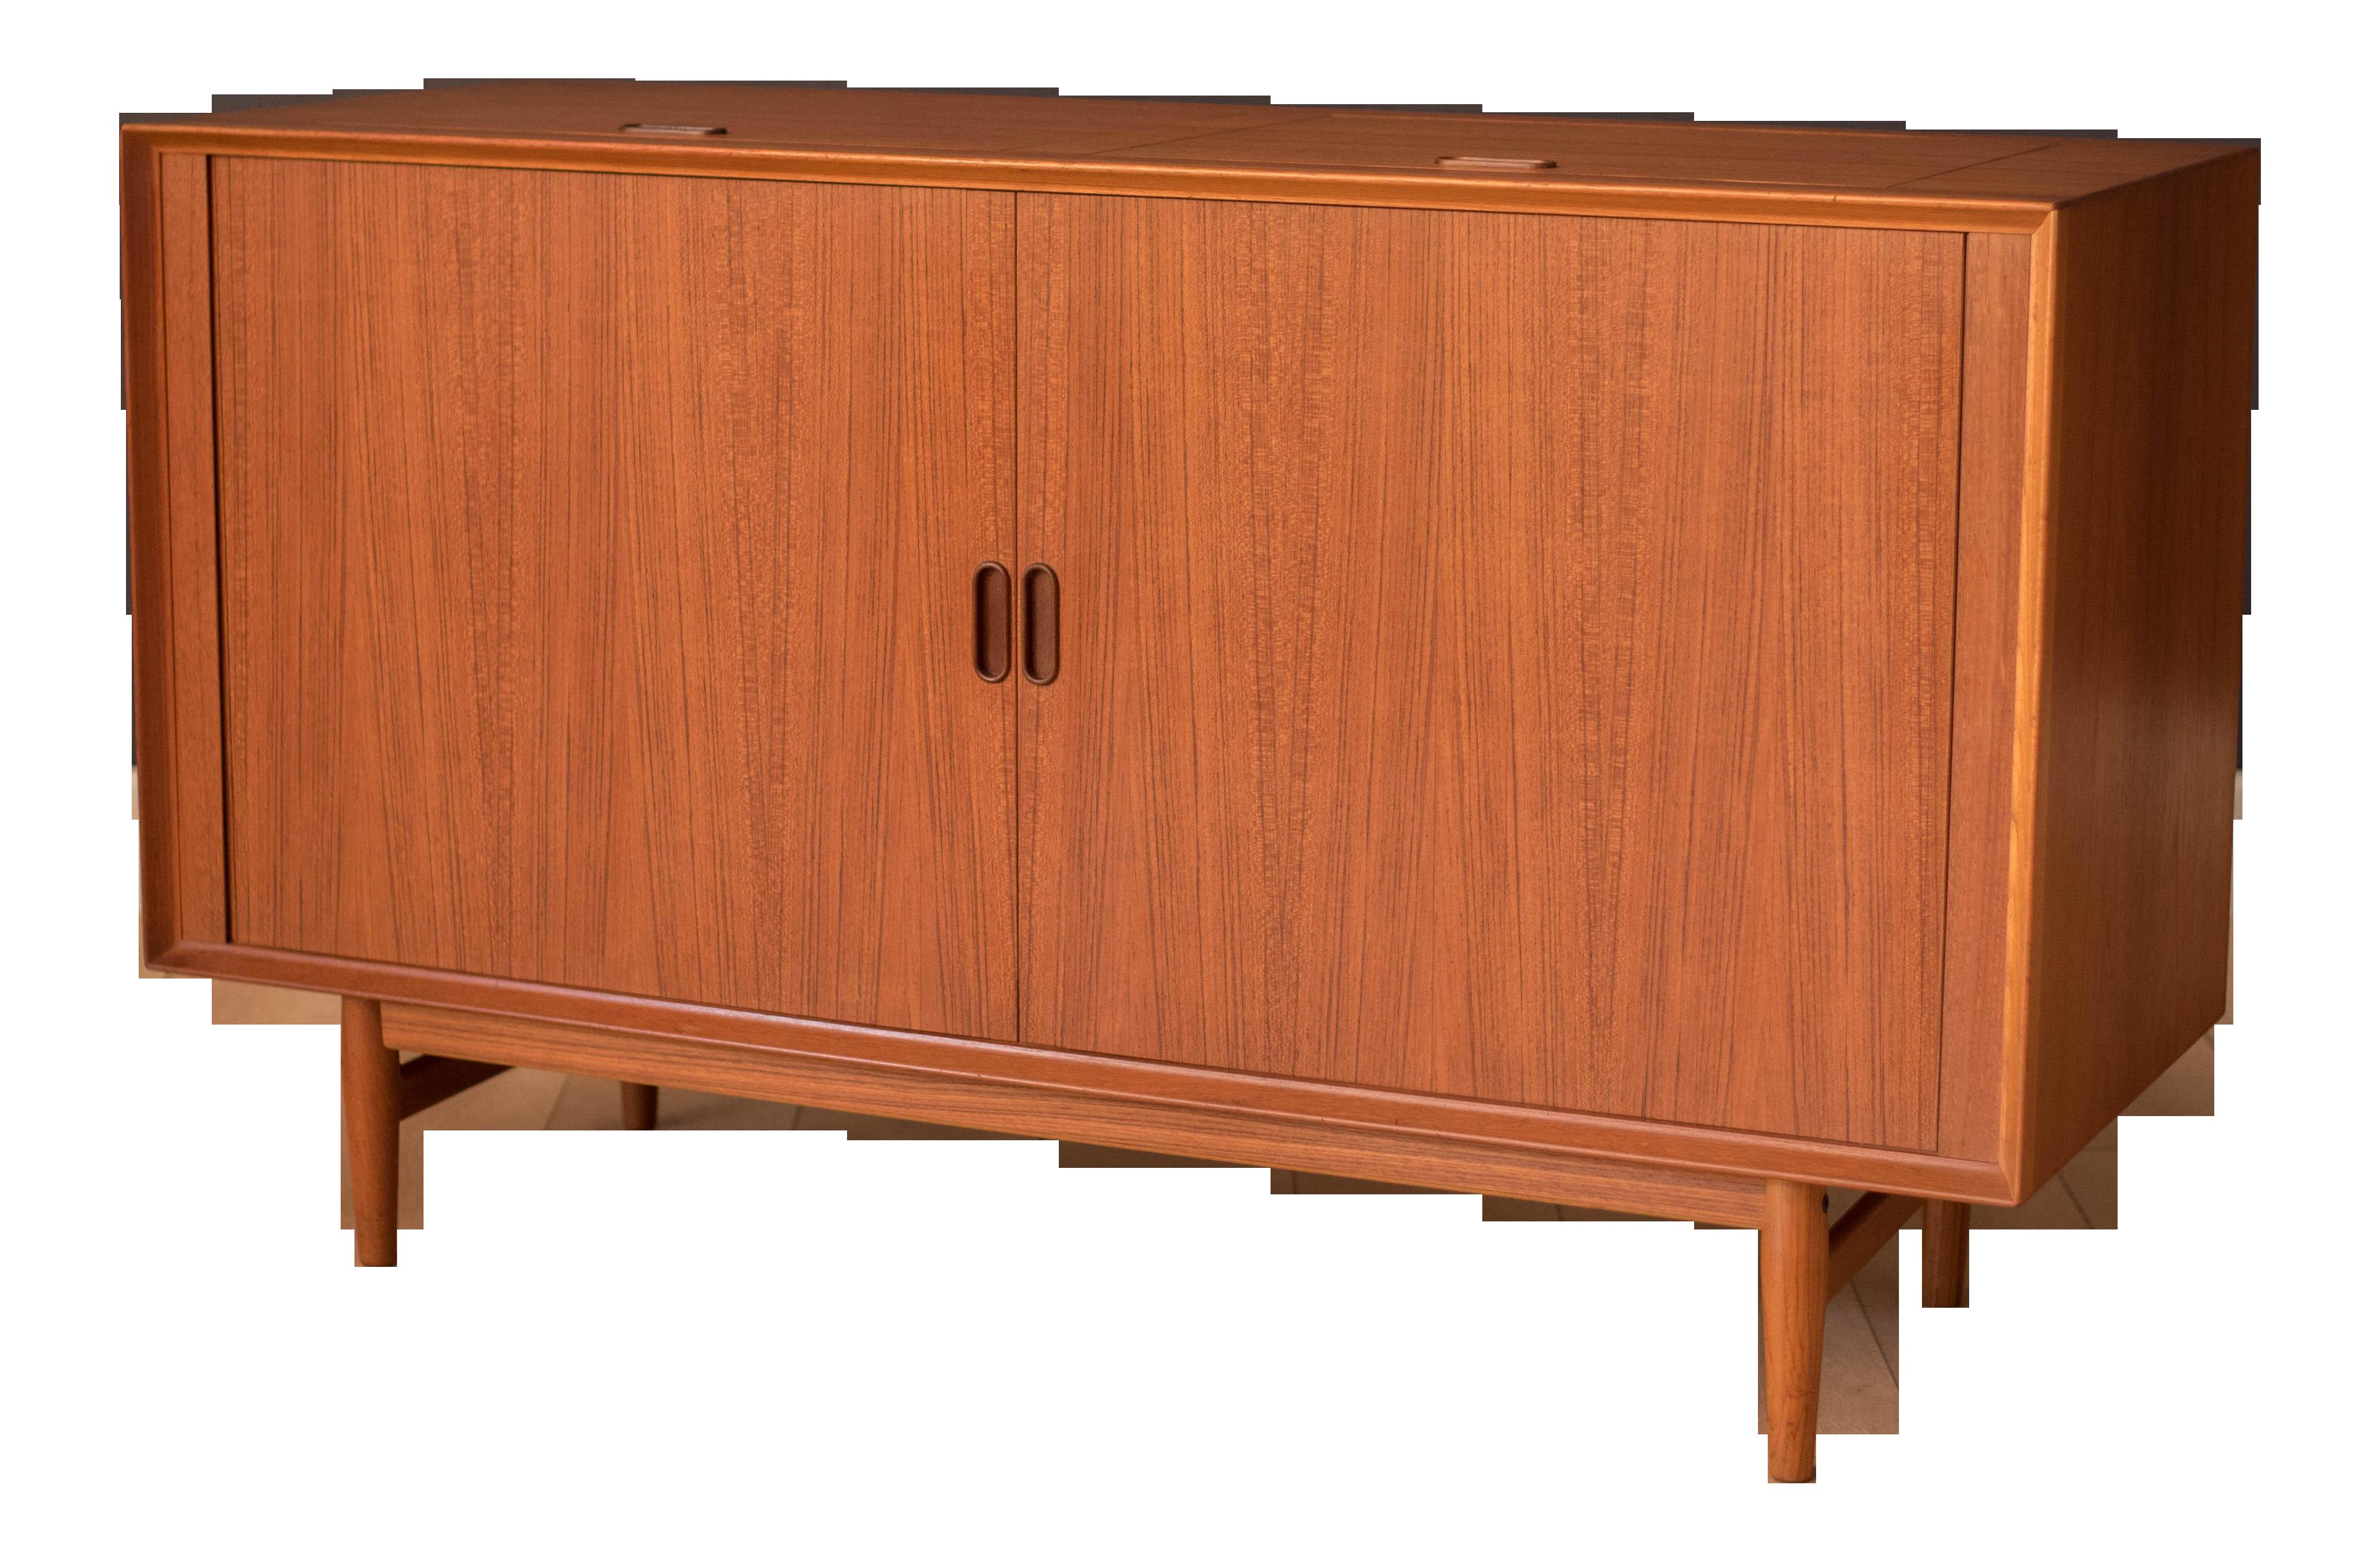 Mid Century Teak Sibast Tambour Door Stereo Console Cabinet By Arne Vodder Chairish